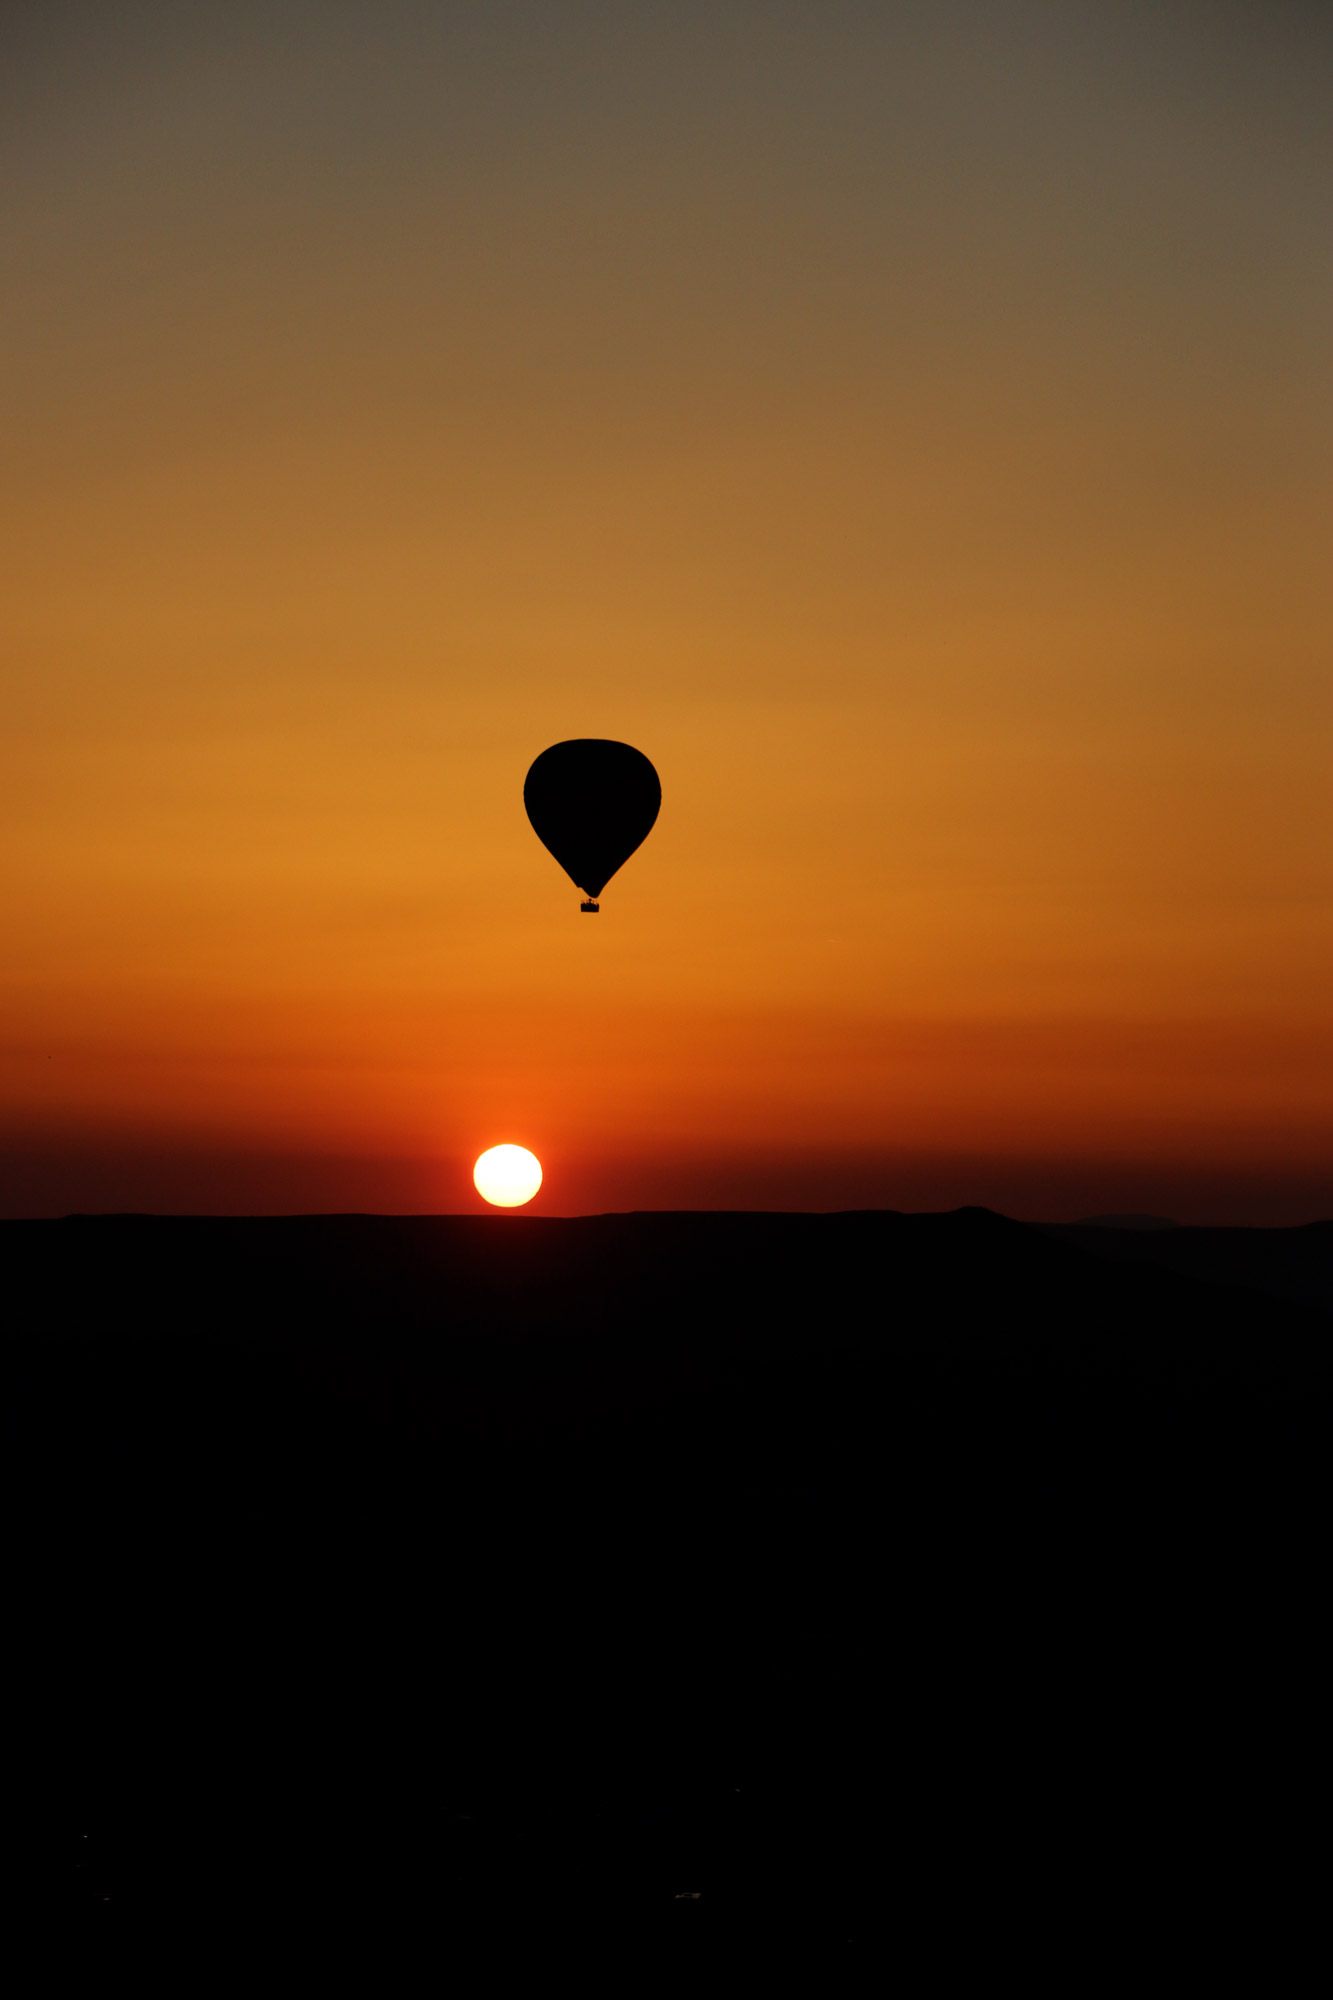 Turkije reisverslag: Laatste dag in Cappadocië - Luchtballonnen boven Cappadocië